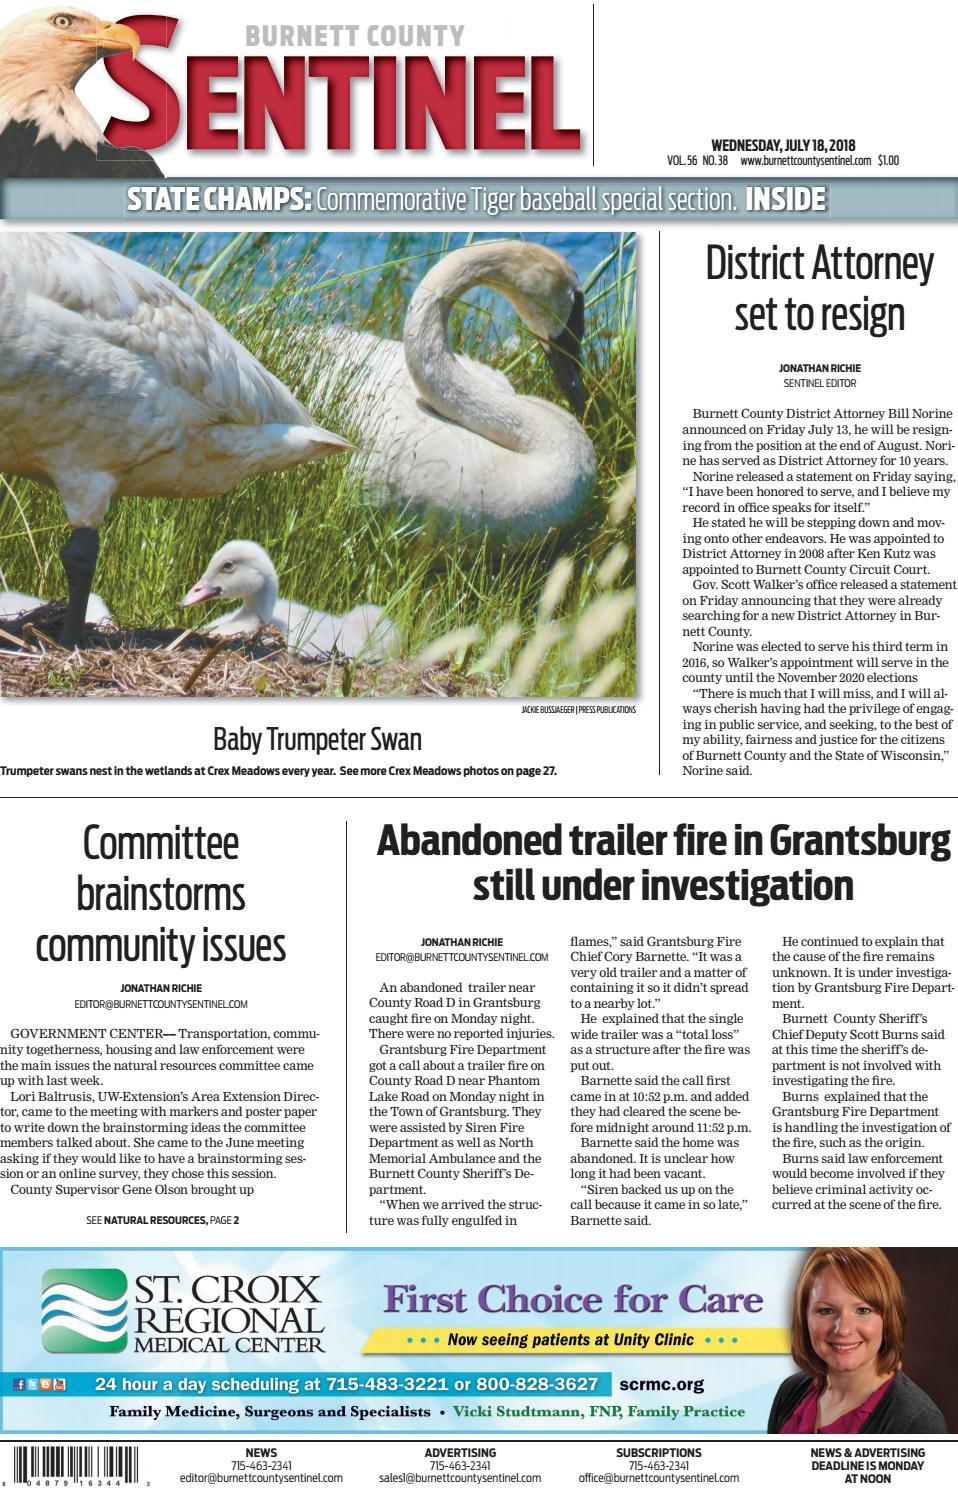 Burnett County Sentinel 07-18-18 by Burnett County Sentinel